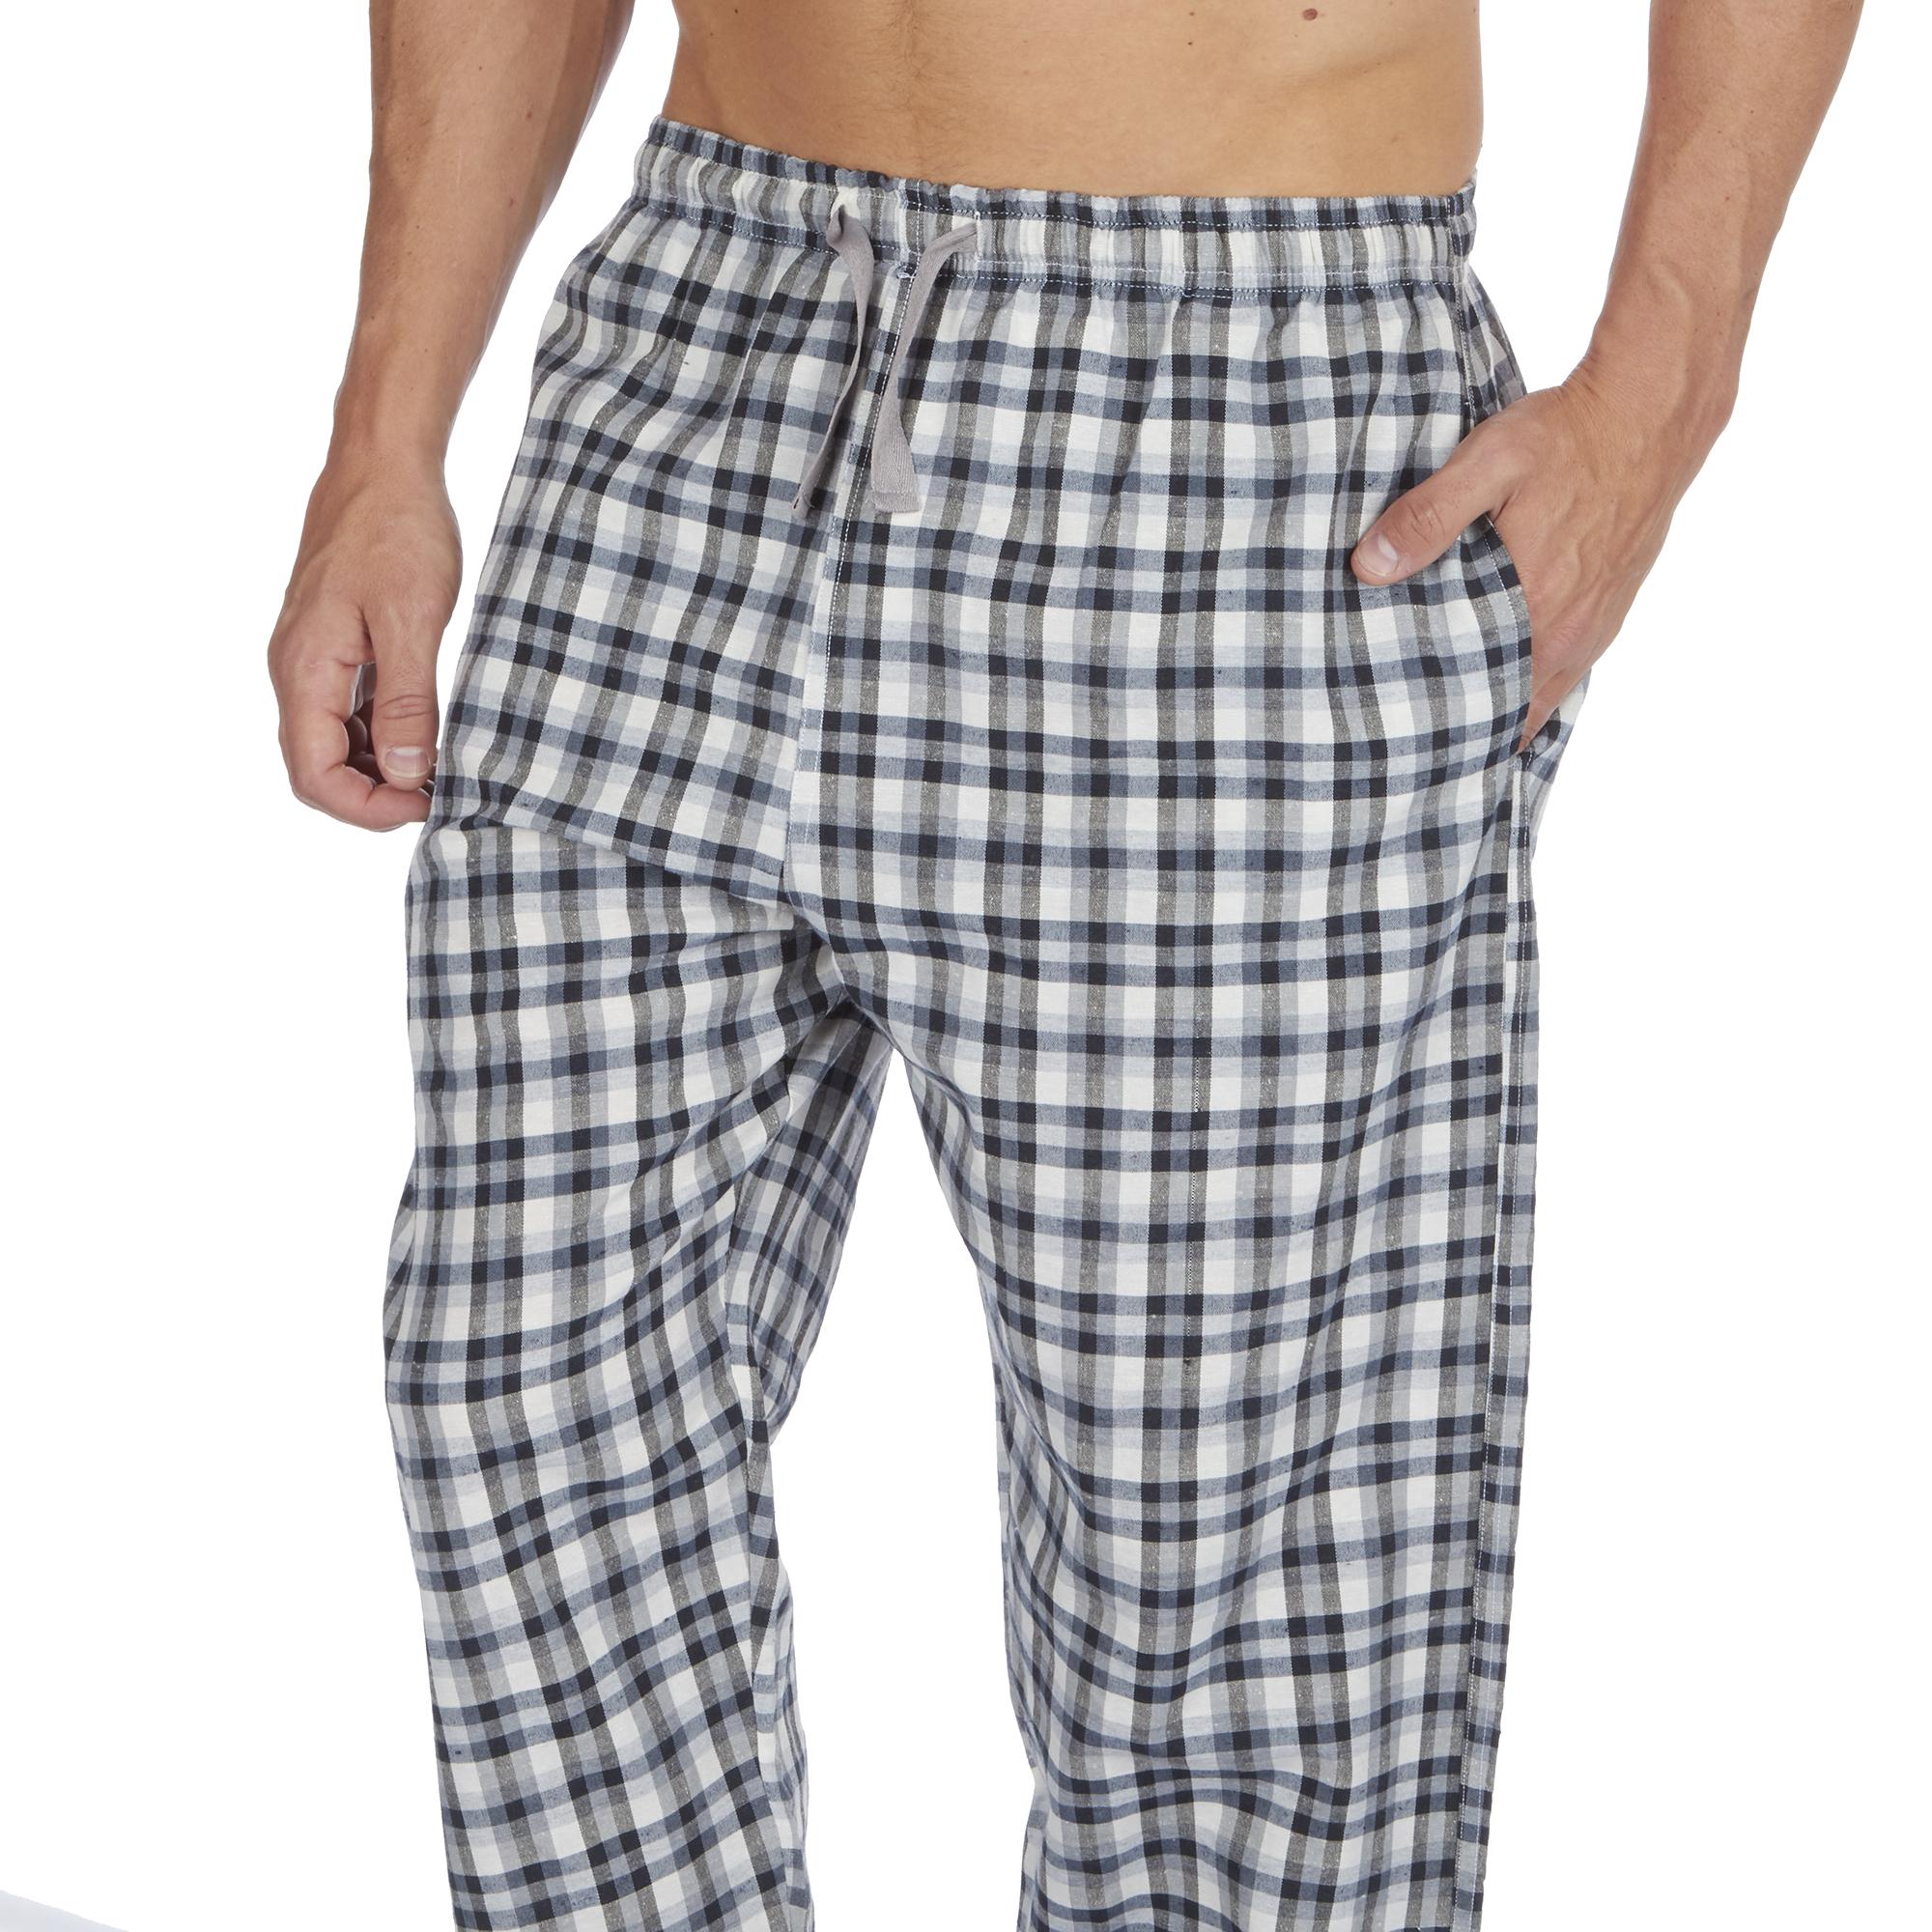 Jason-Jones-Homme-Carreaux-Tisse-Pyjama-Pantalon-en-Coton-Melange-Serge-PJ-Lounge-Pants miniature 6